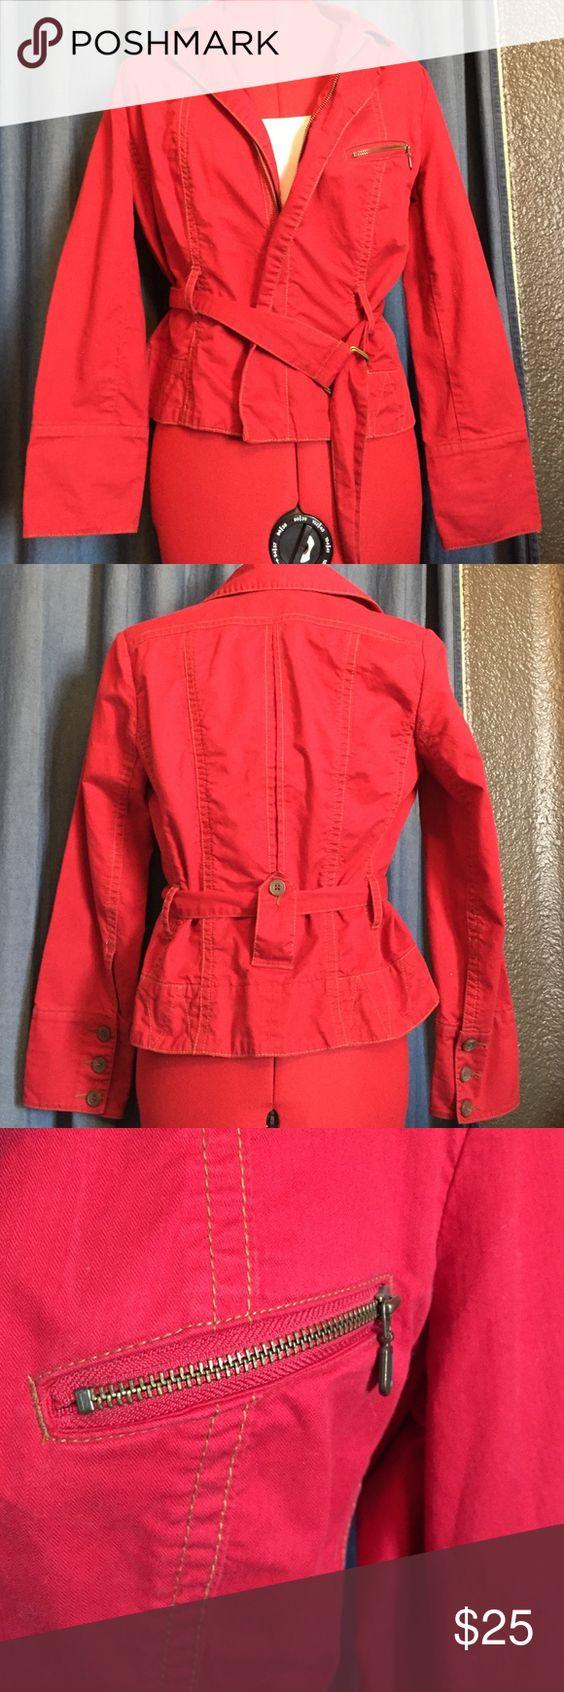 Red Cabi jacket💄 Like new! Super cute and stylish! CAbi Jackets & Coats Pea Coats